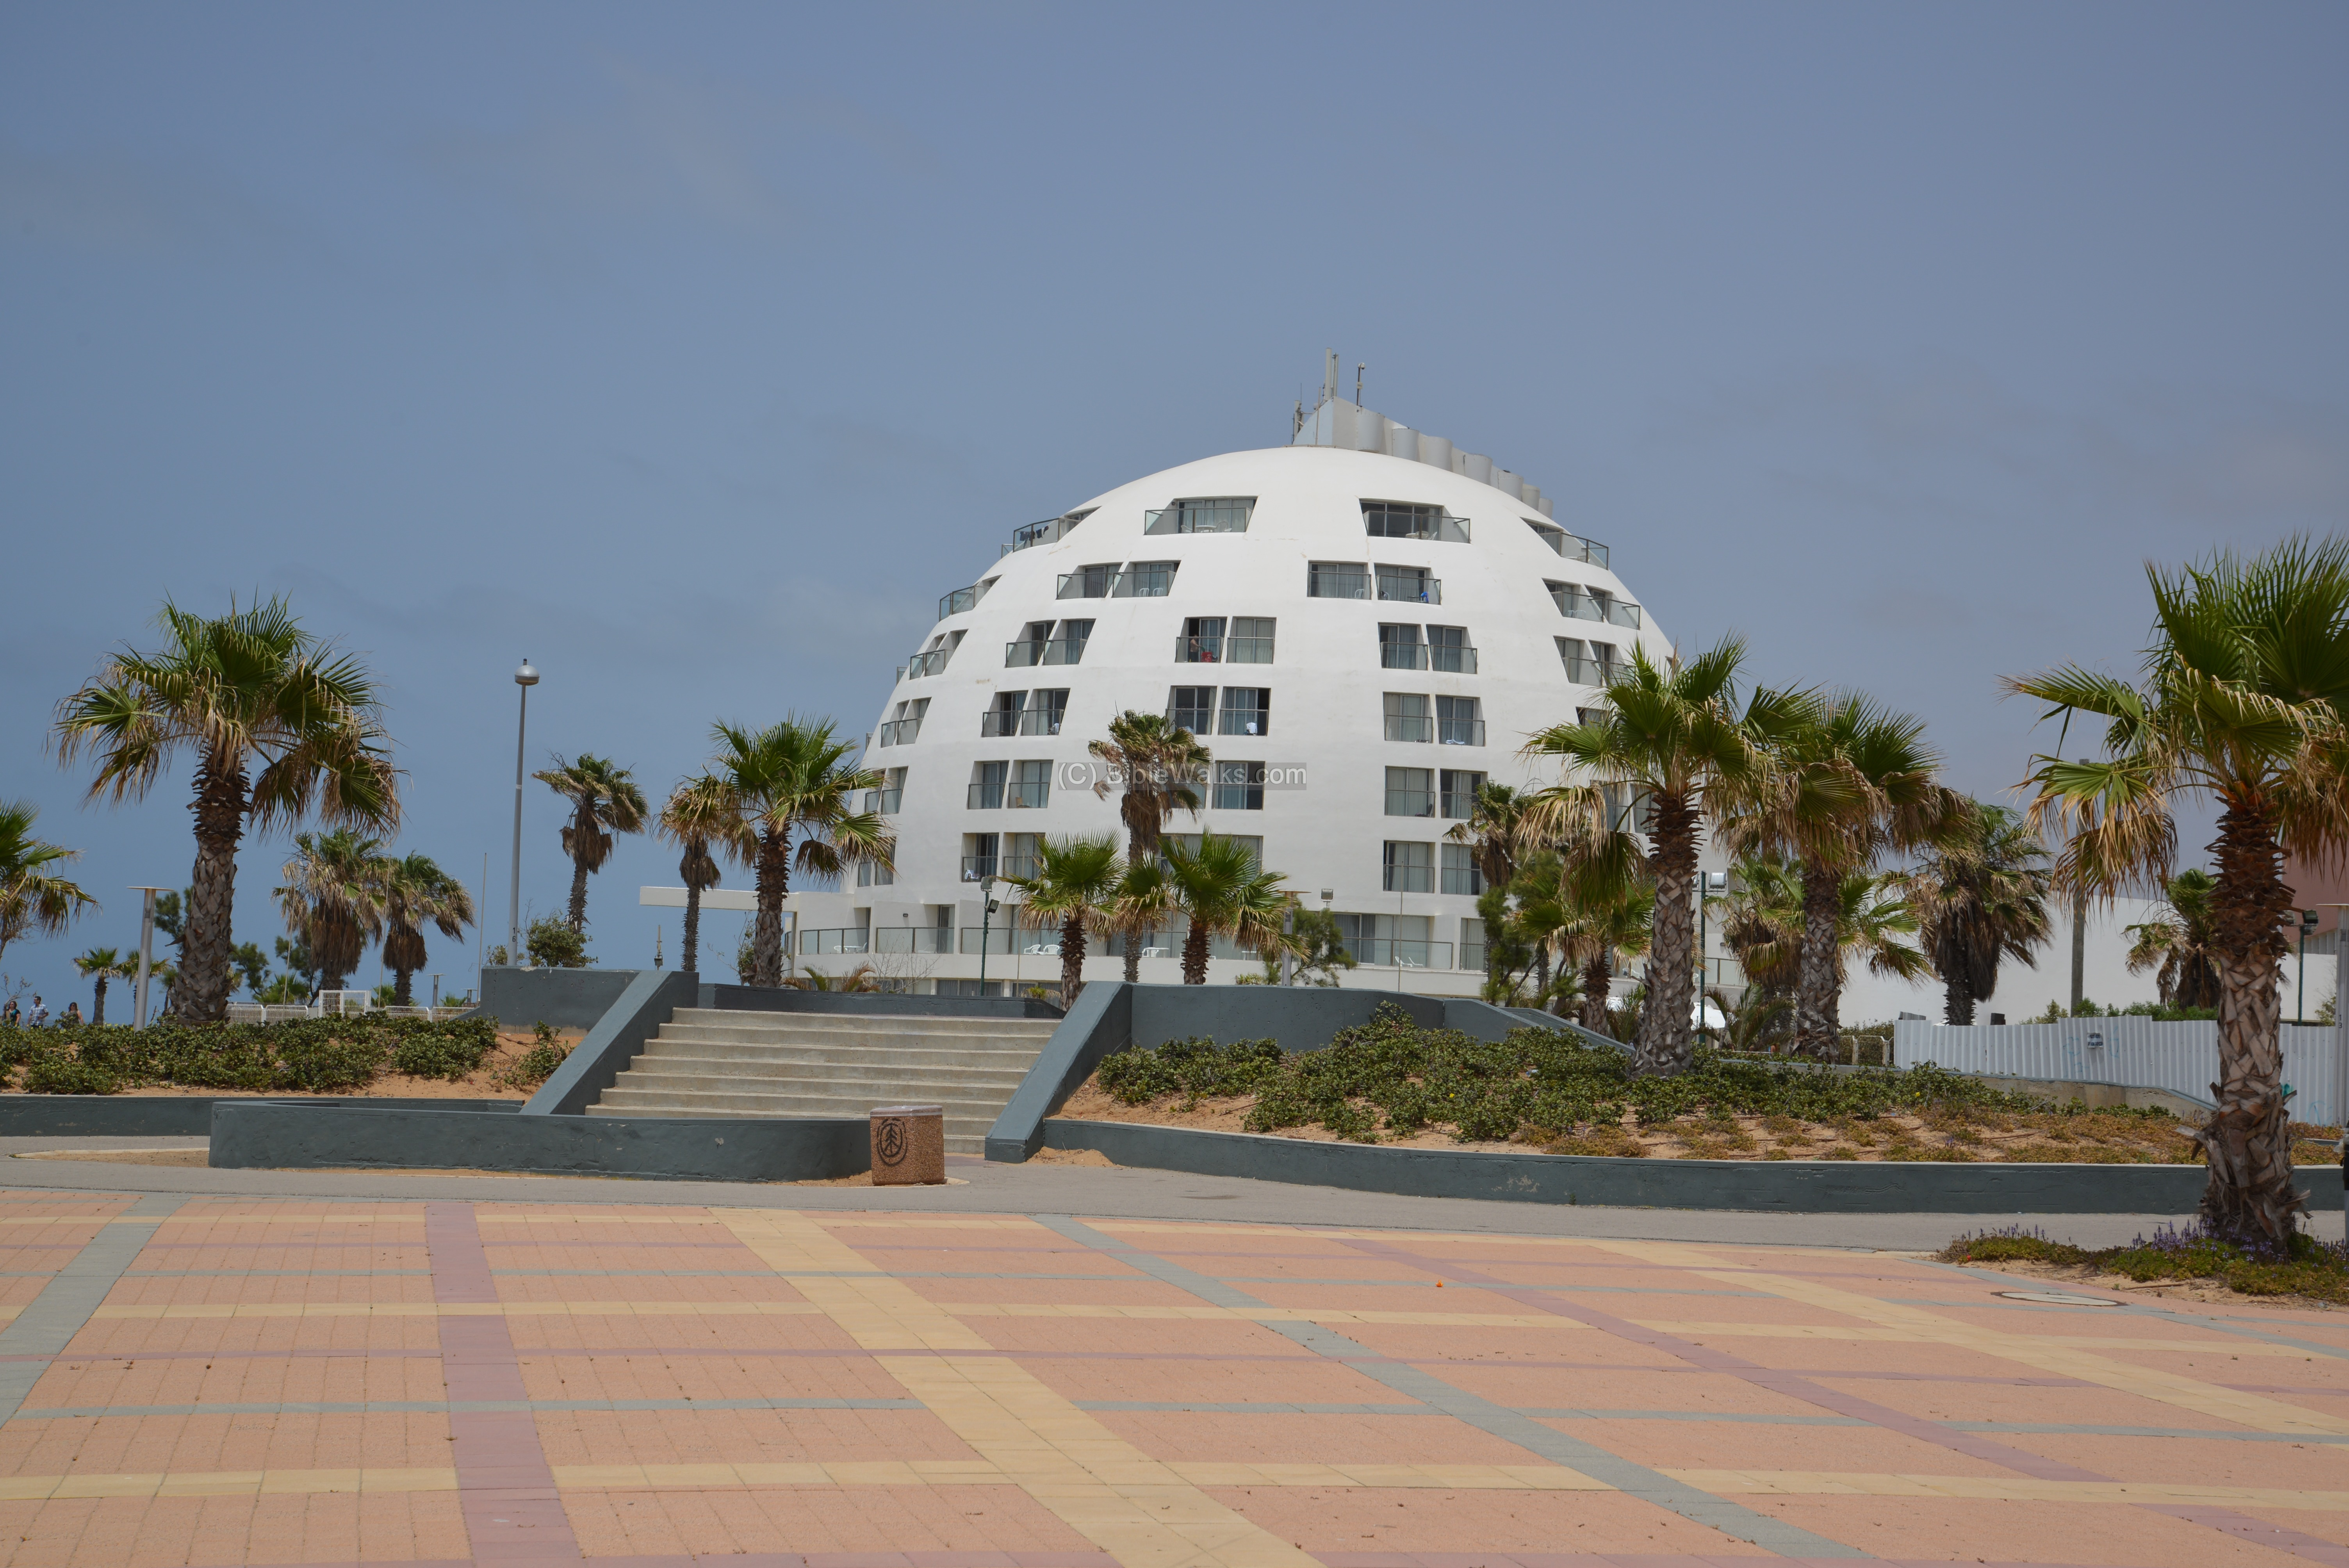 Sites of Ashkelon City